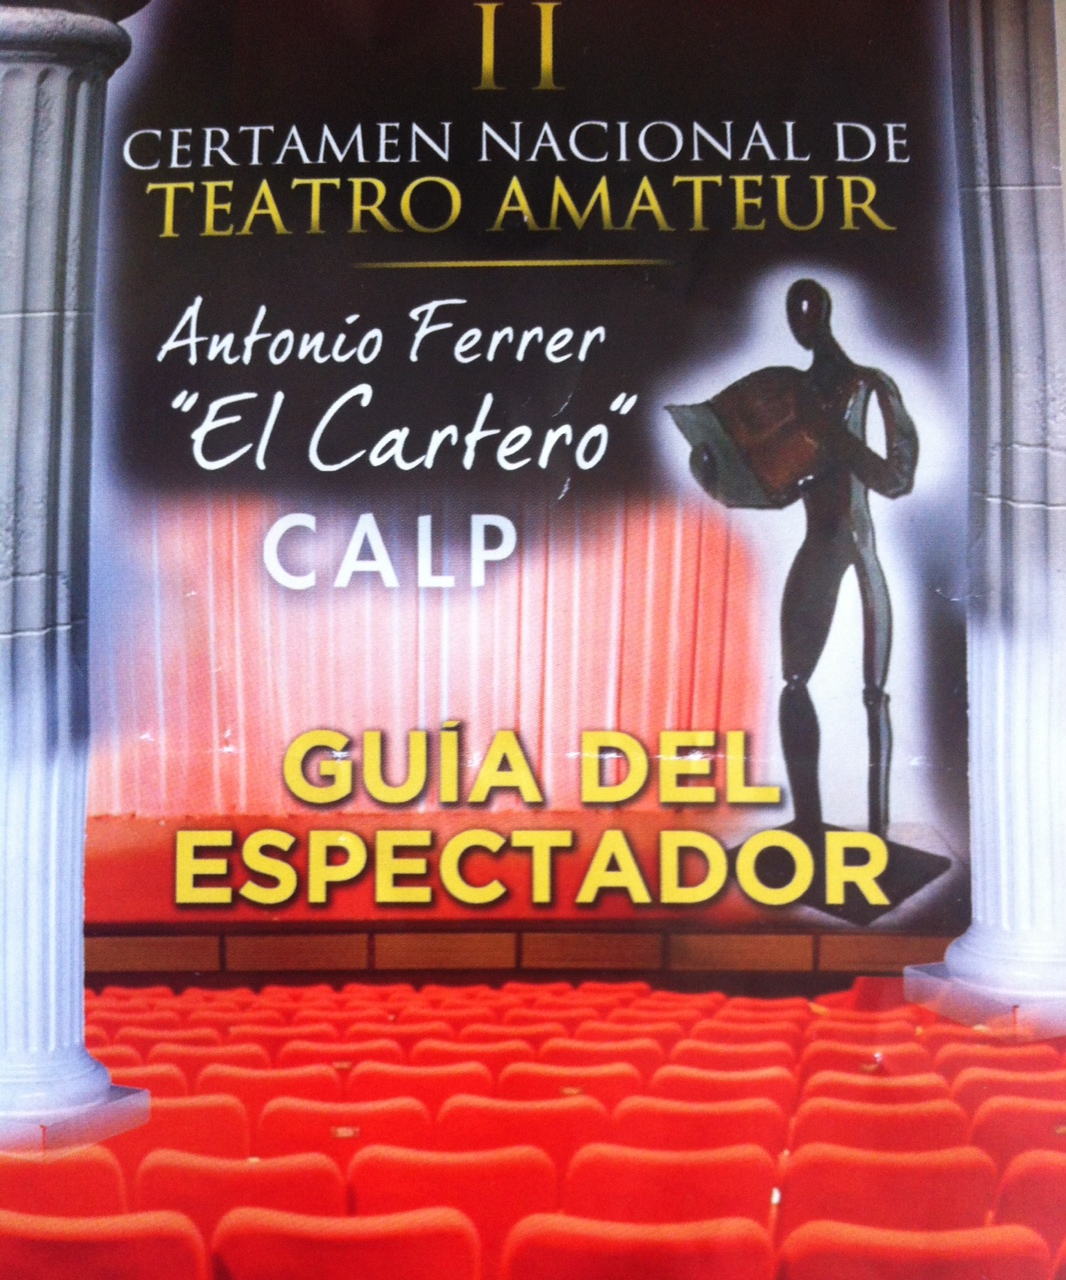 "II Certamen Nacional de Teatro Amateur ""Antonio Ferrer"" - Calpe 2013"